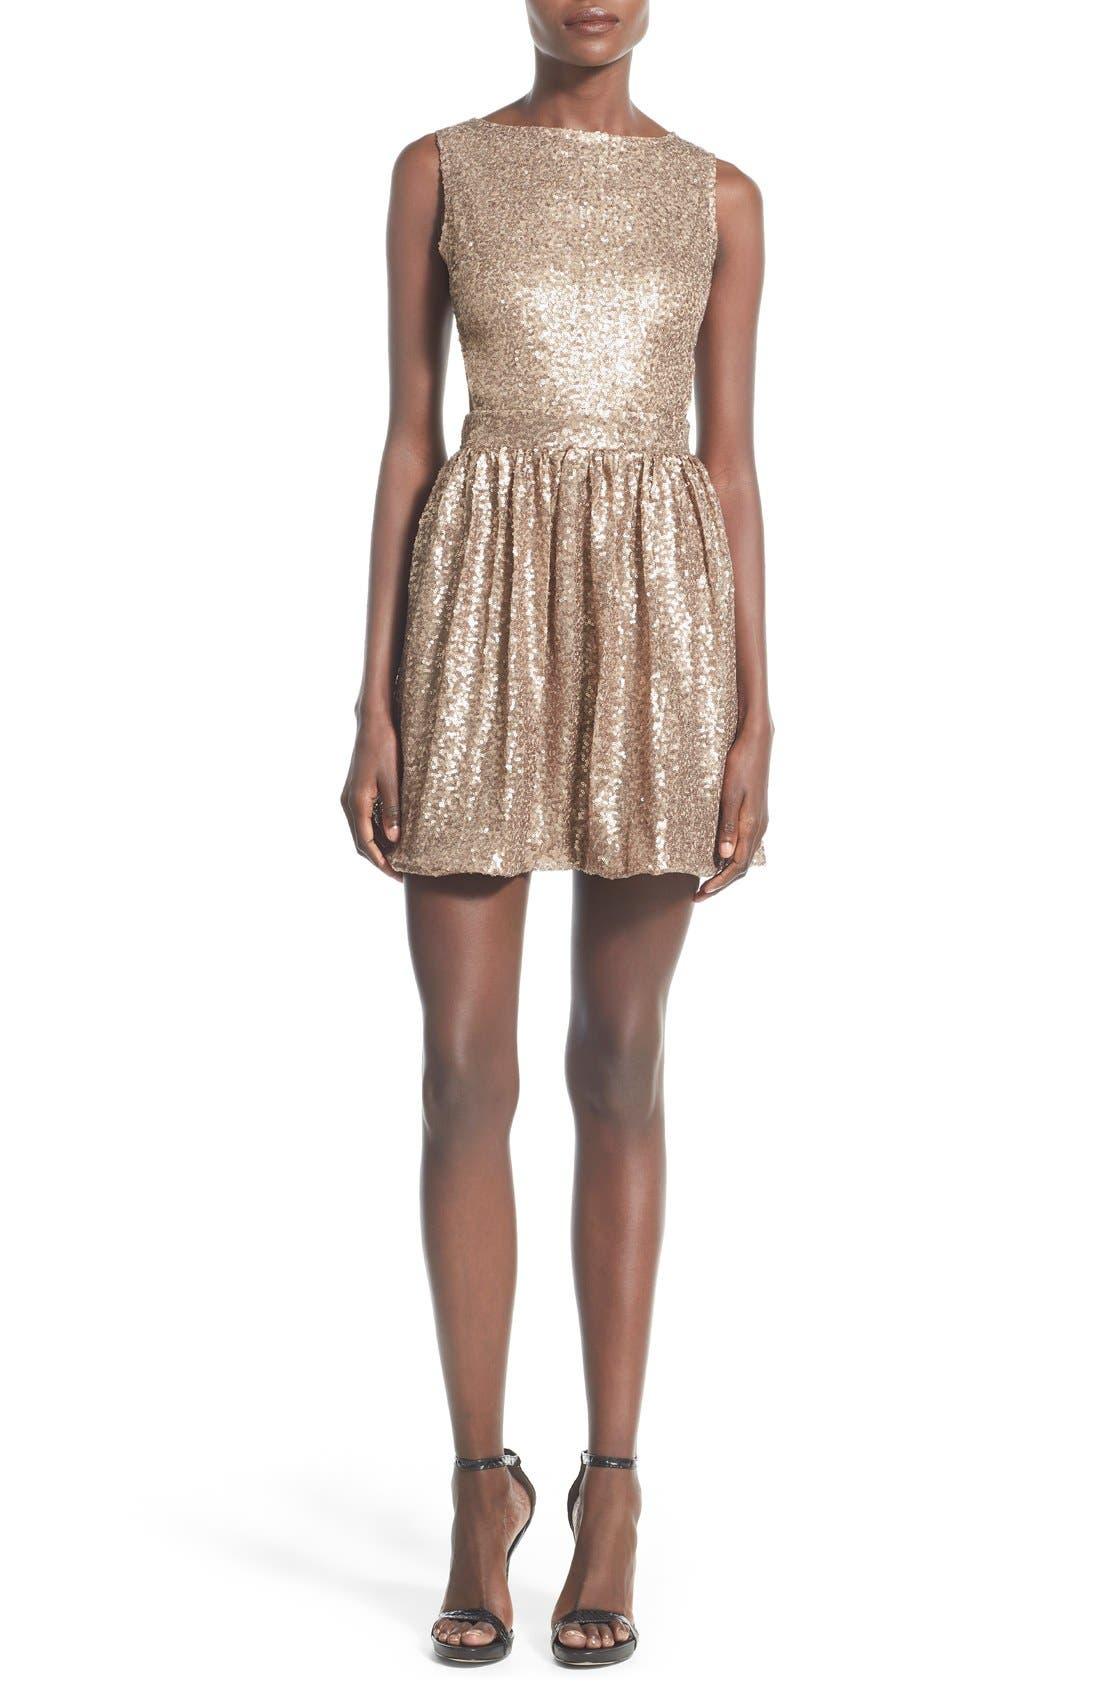 Alternate Image 1 Selected - Raga Sequin Cutout Sleeveless Dress